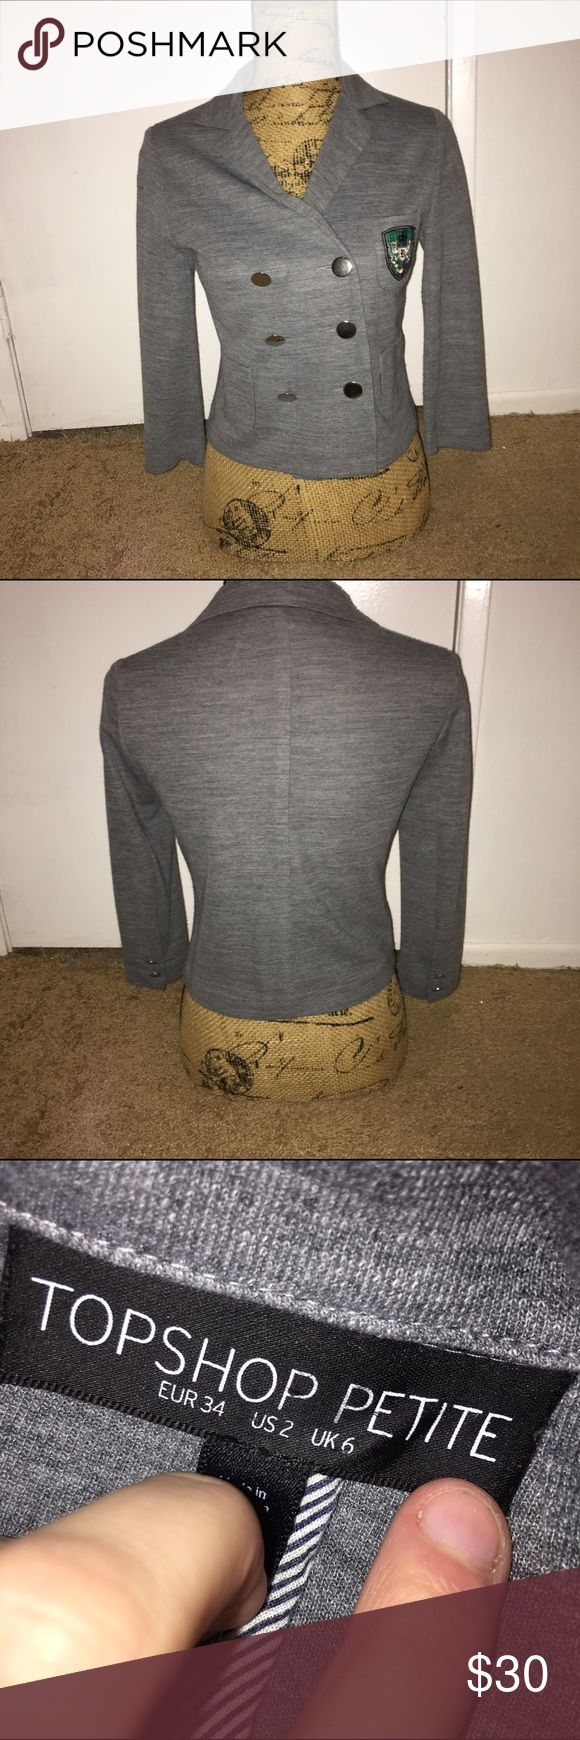 Size 2 TOPSHOP Petite blazer jacket We look at all offers (A33) Topshop PETITE Jackets & Coats Blazers